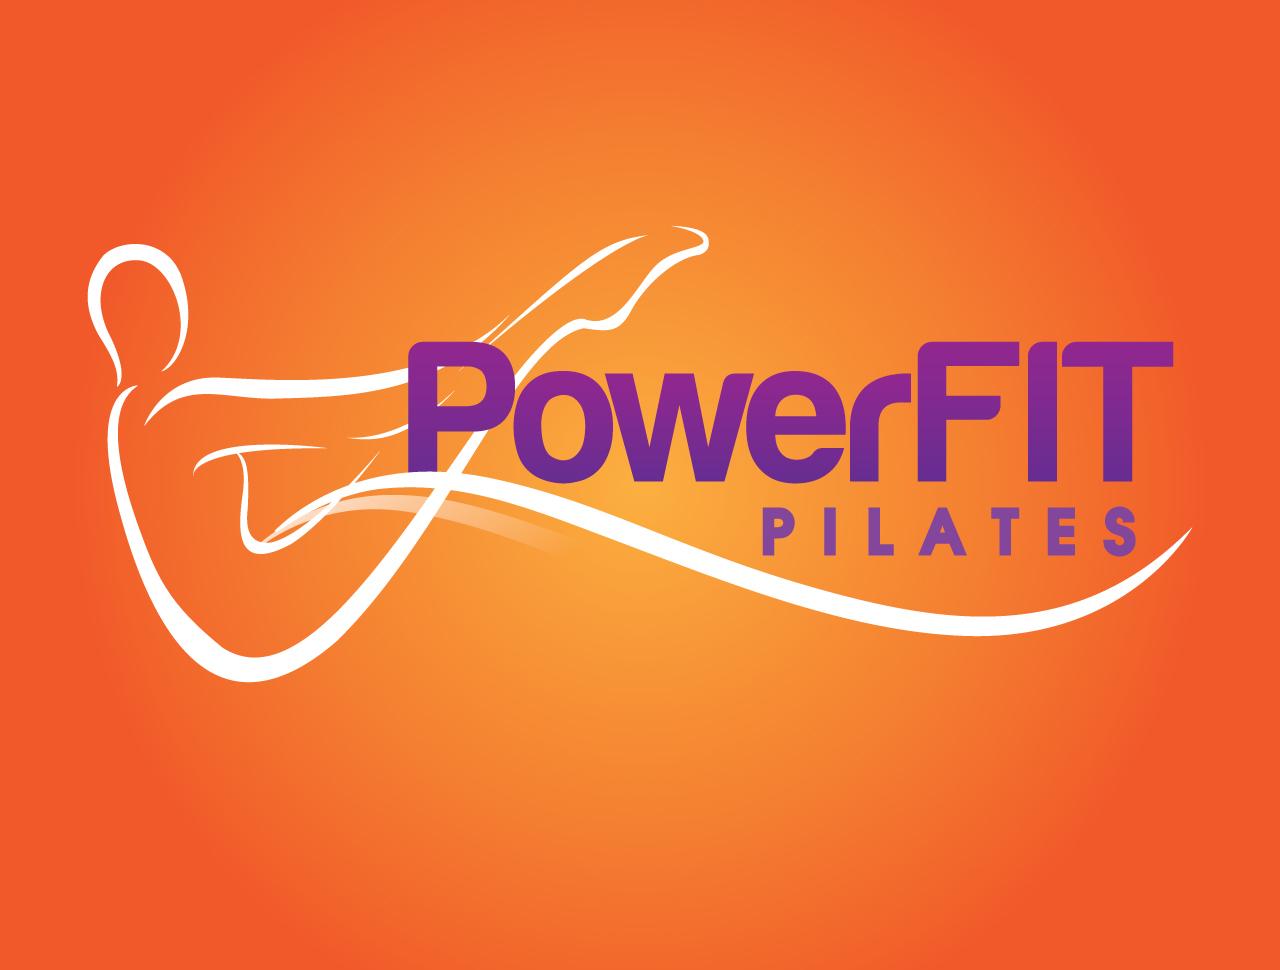 powerfit pilates.jpg